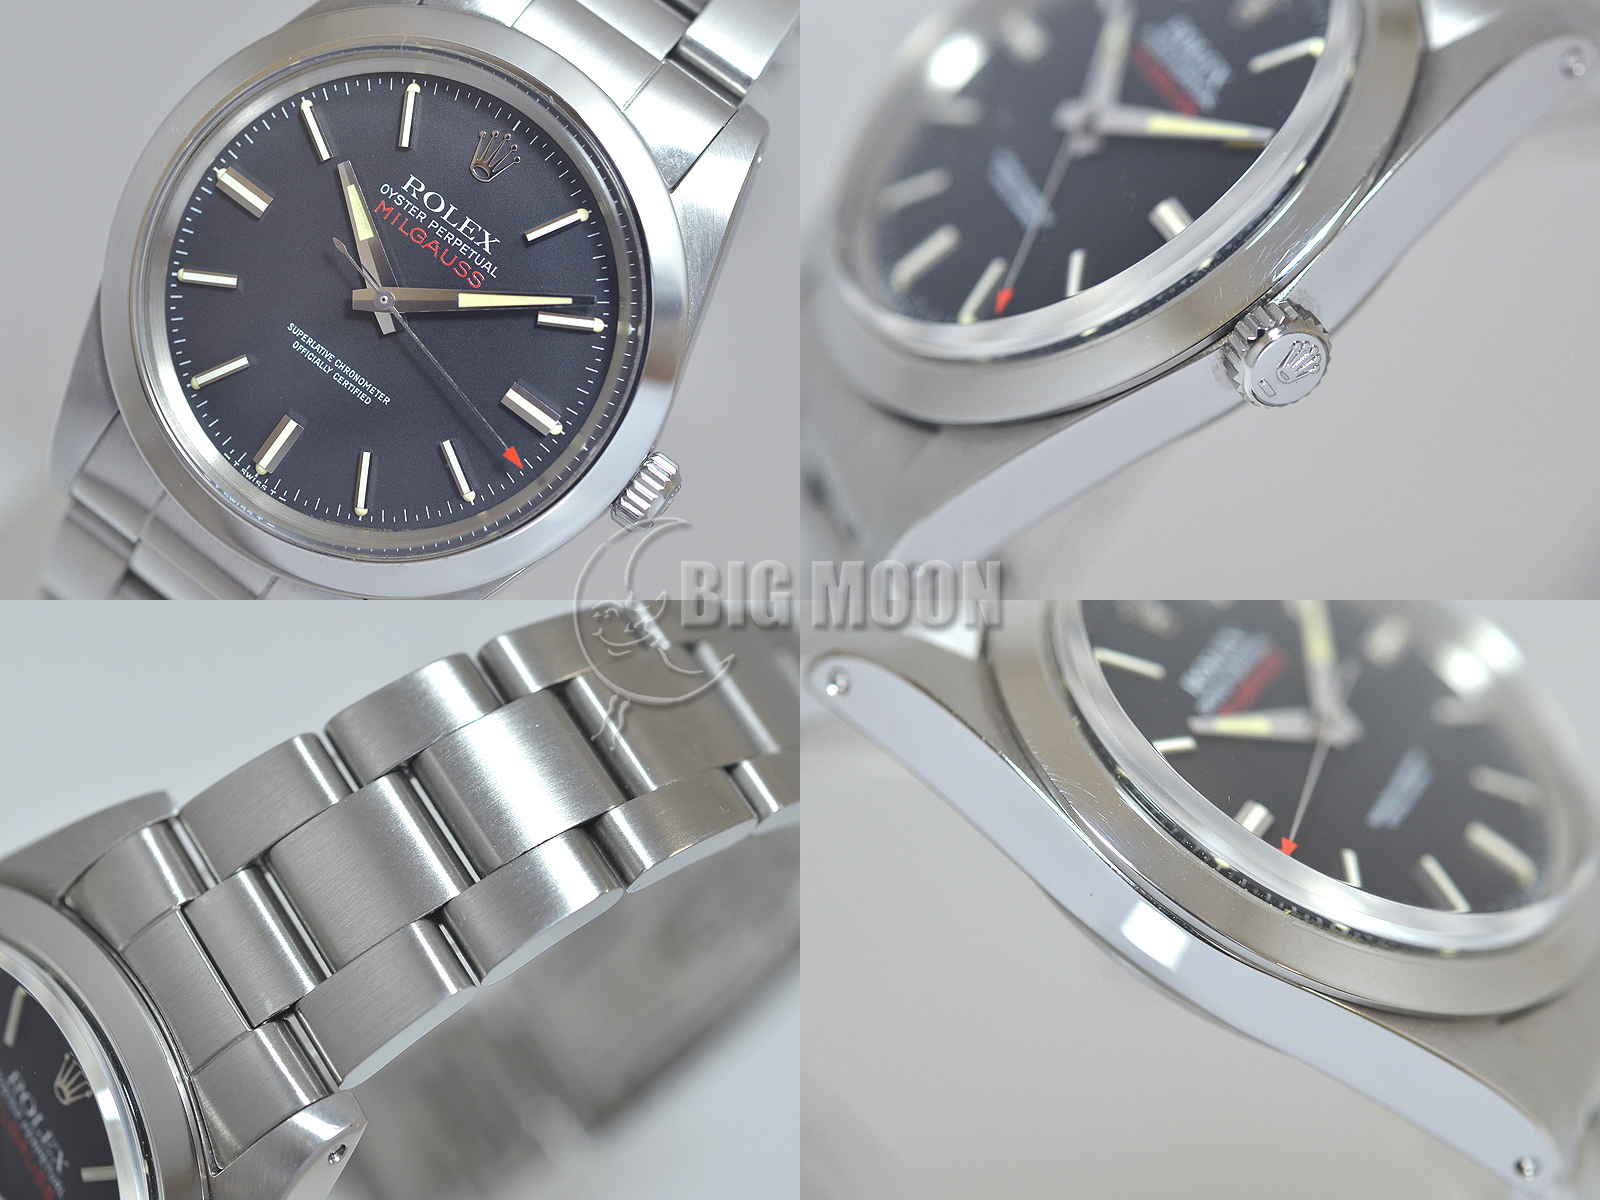 on sale 38ccc 91583 ロレックス ヴィンテージ ミルガウス 型式:1019 商品番号 ...